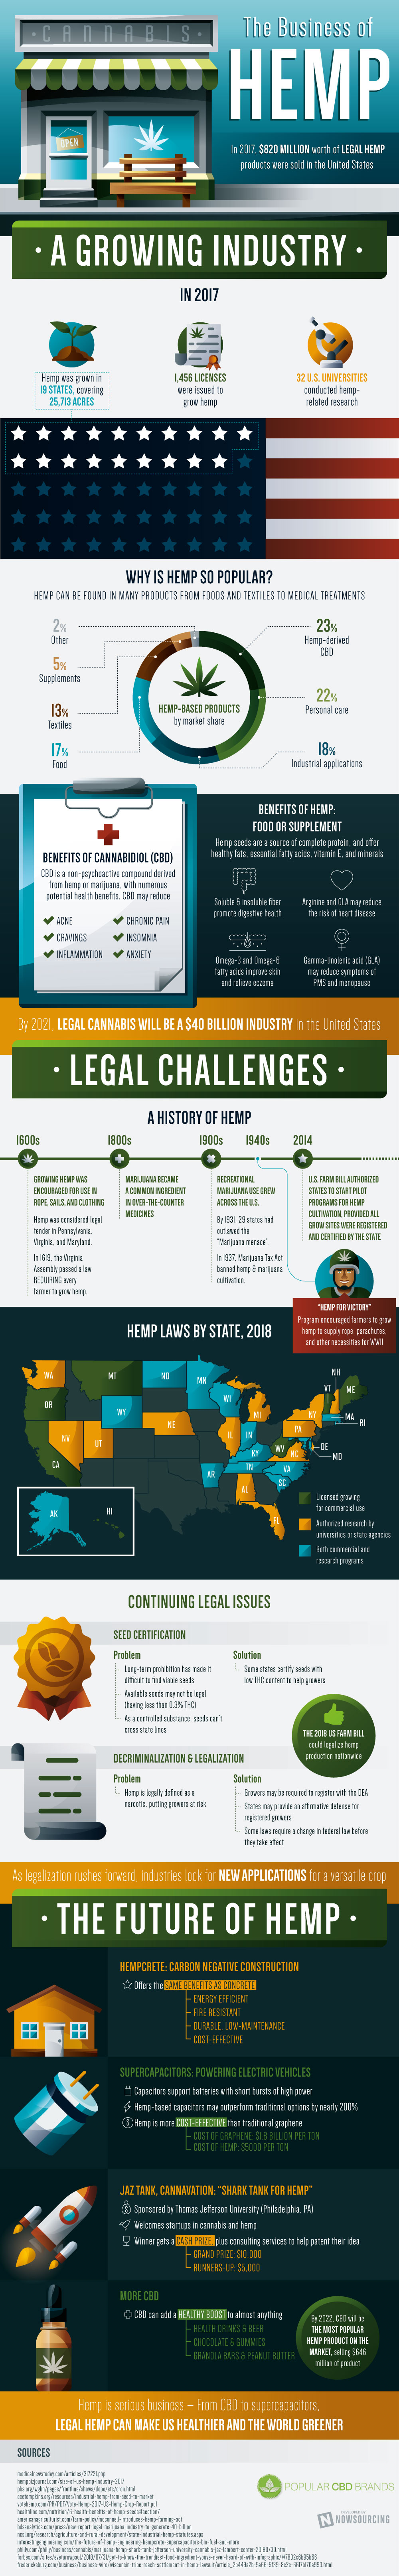 The Business of Hemp